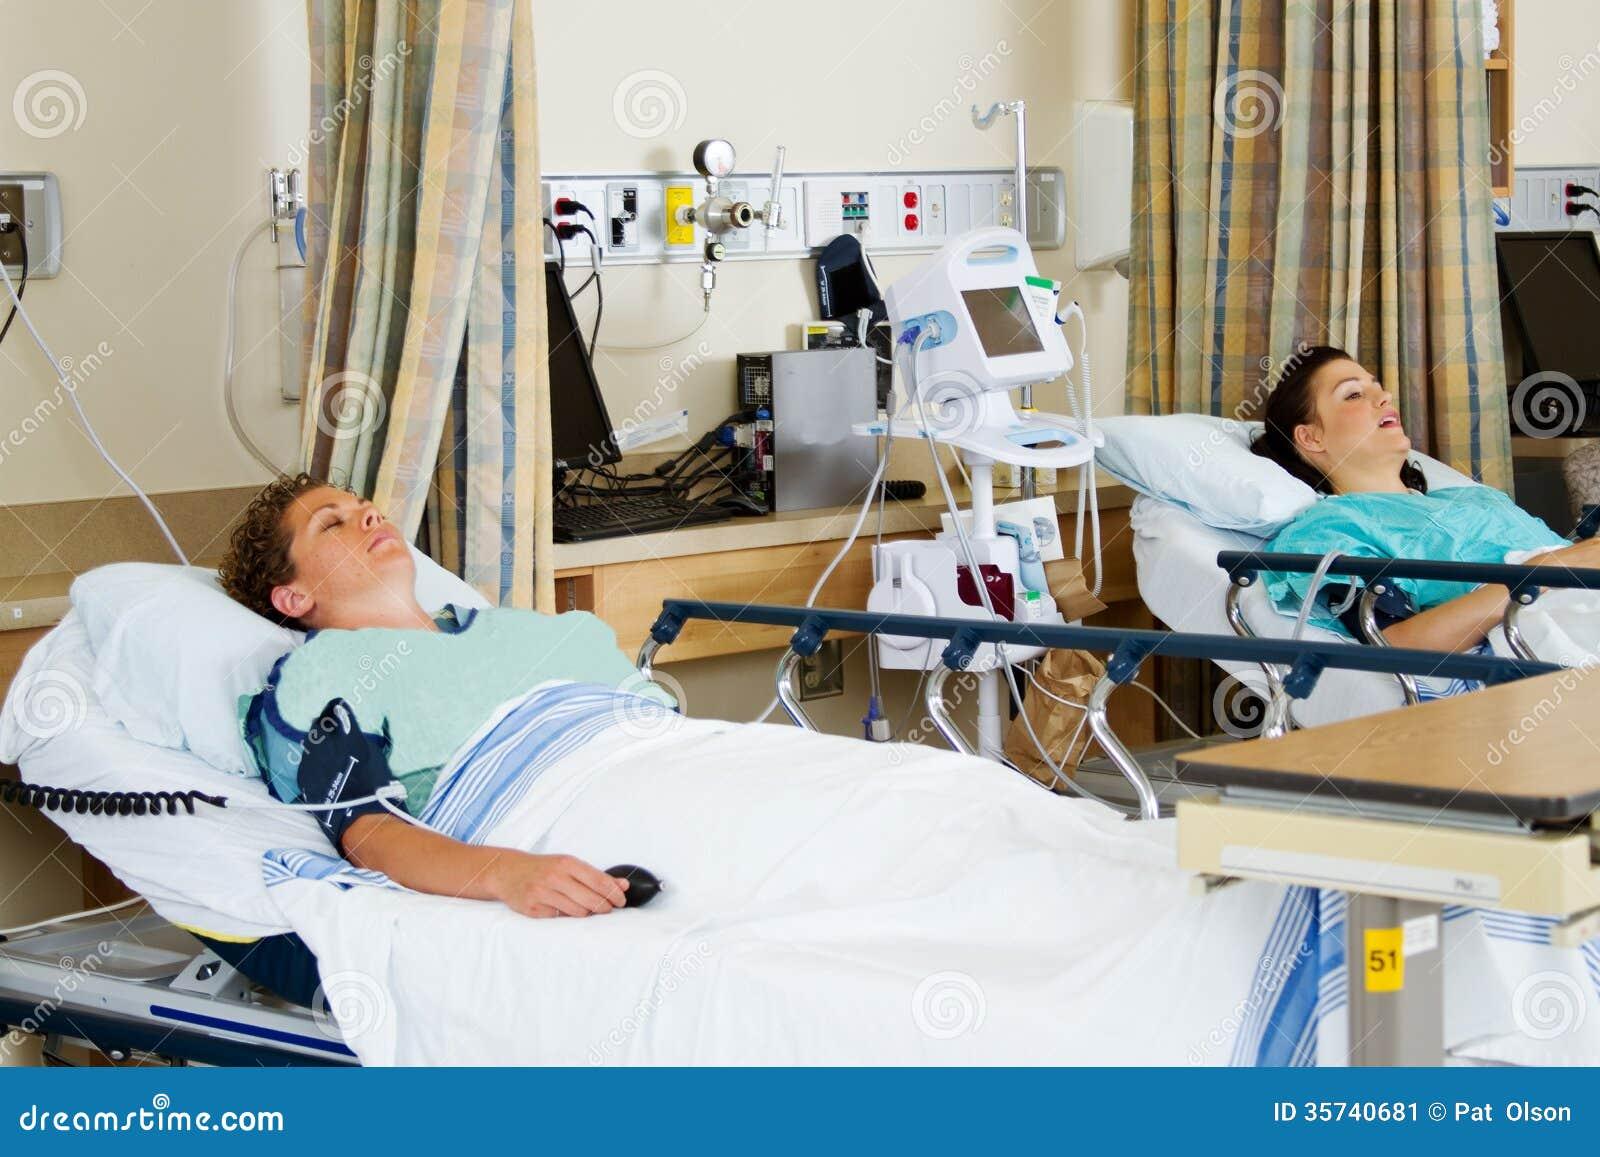 the patient in room nine pdf download